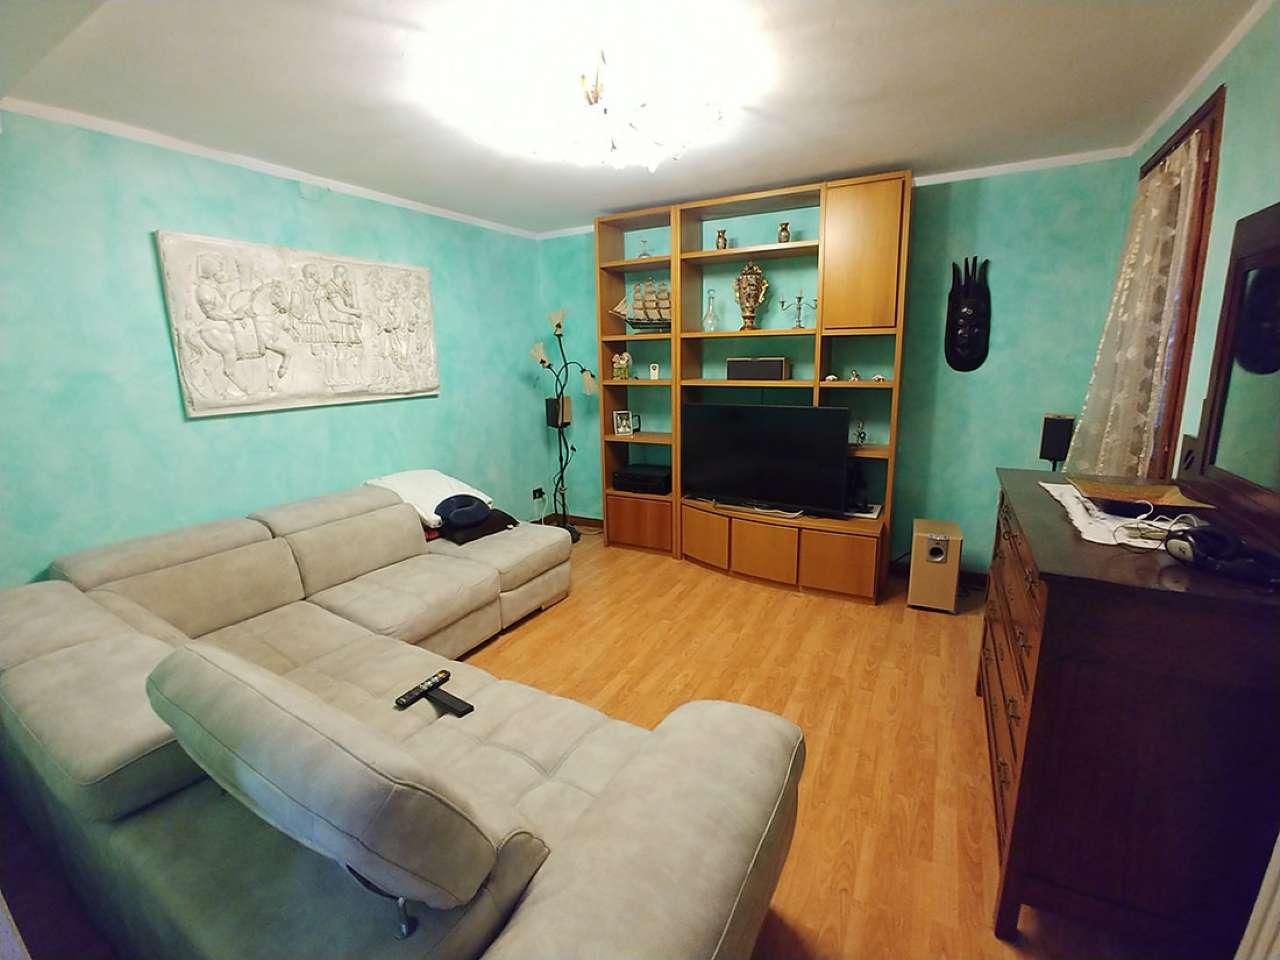 Casa Indipendente in condizioni mediocri in vendita Rif. 8719956